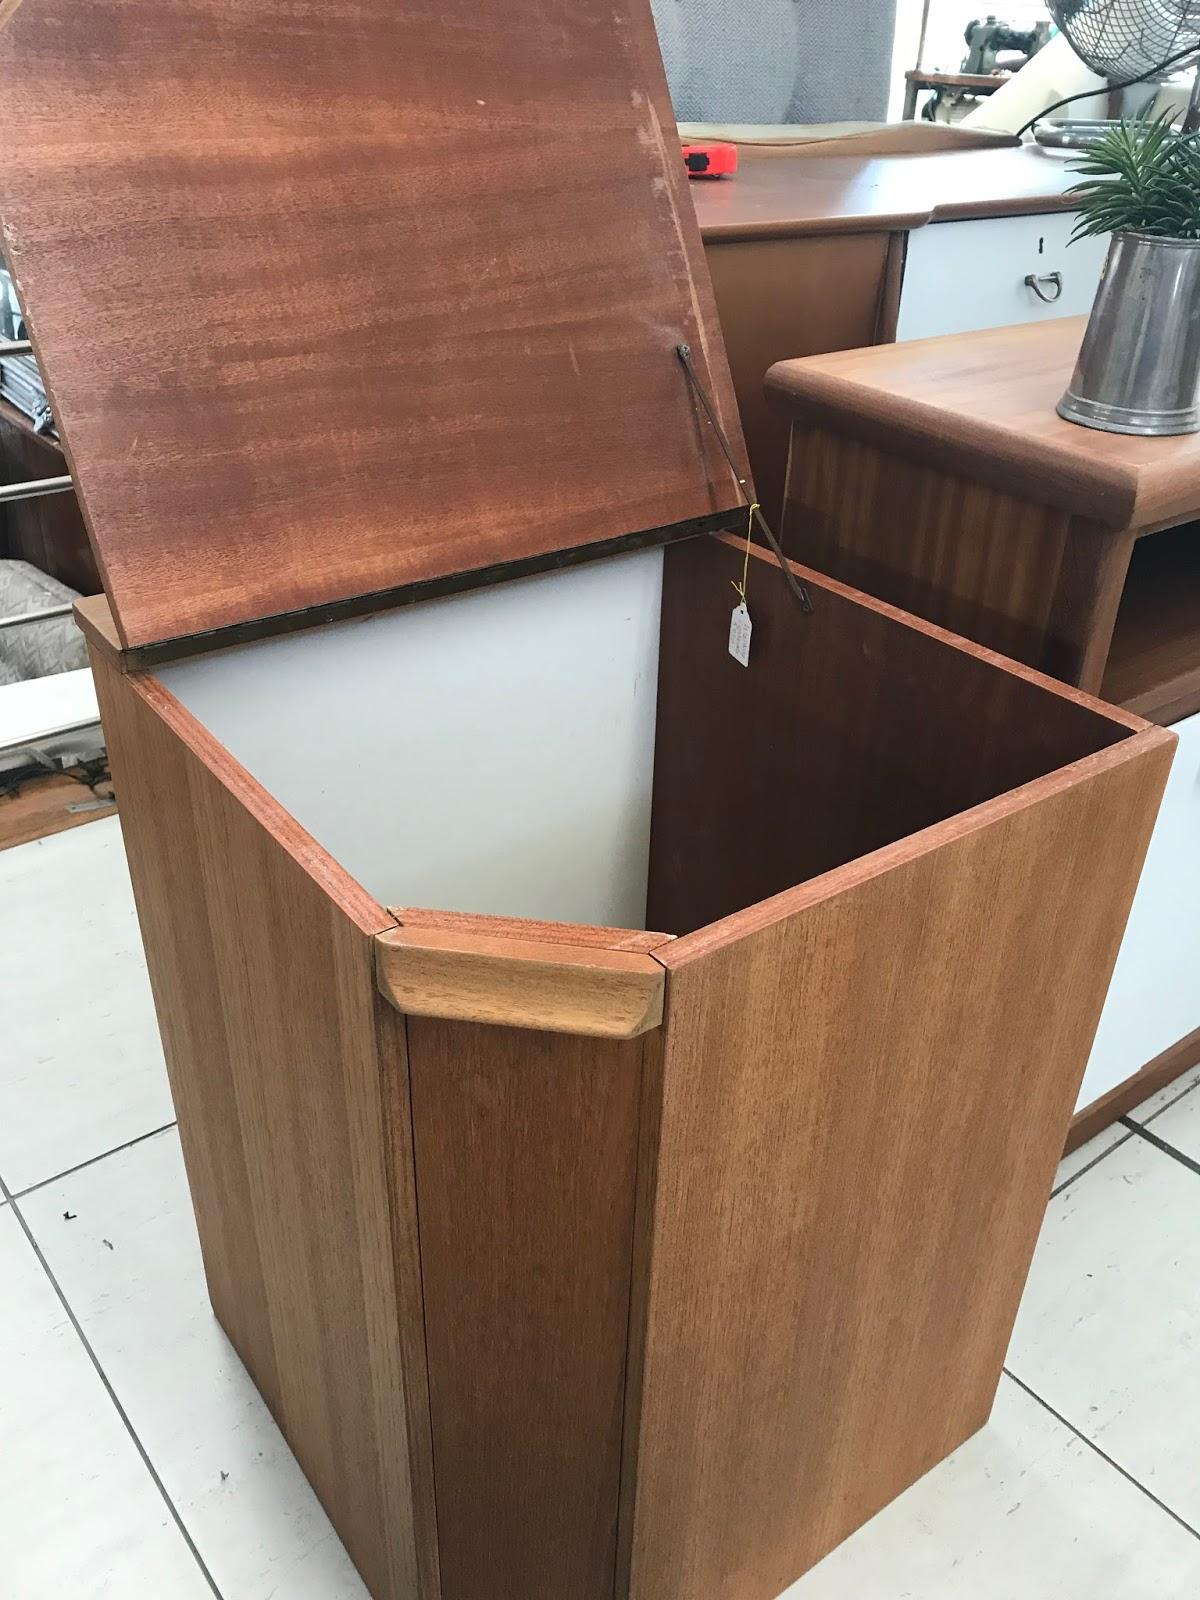 Appel N Ui Furniture Amp Others